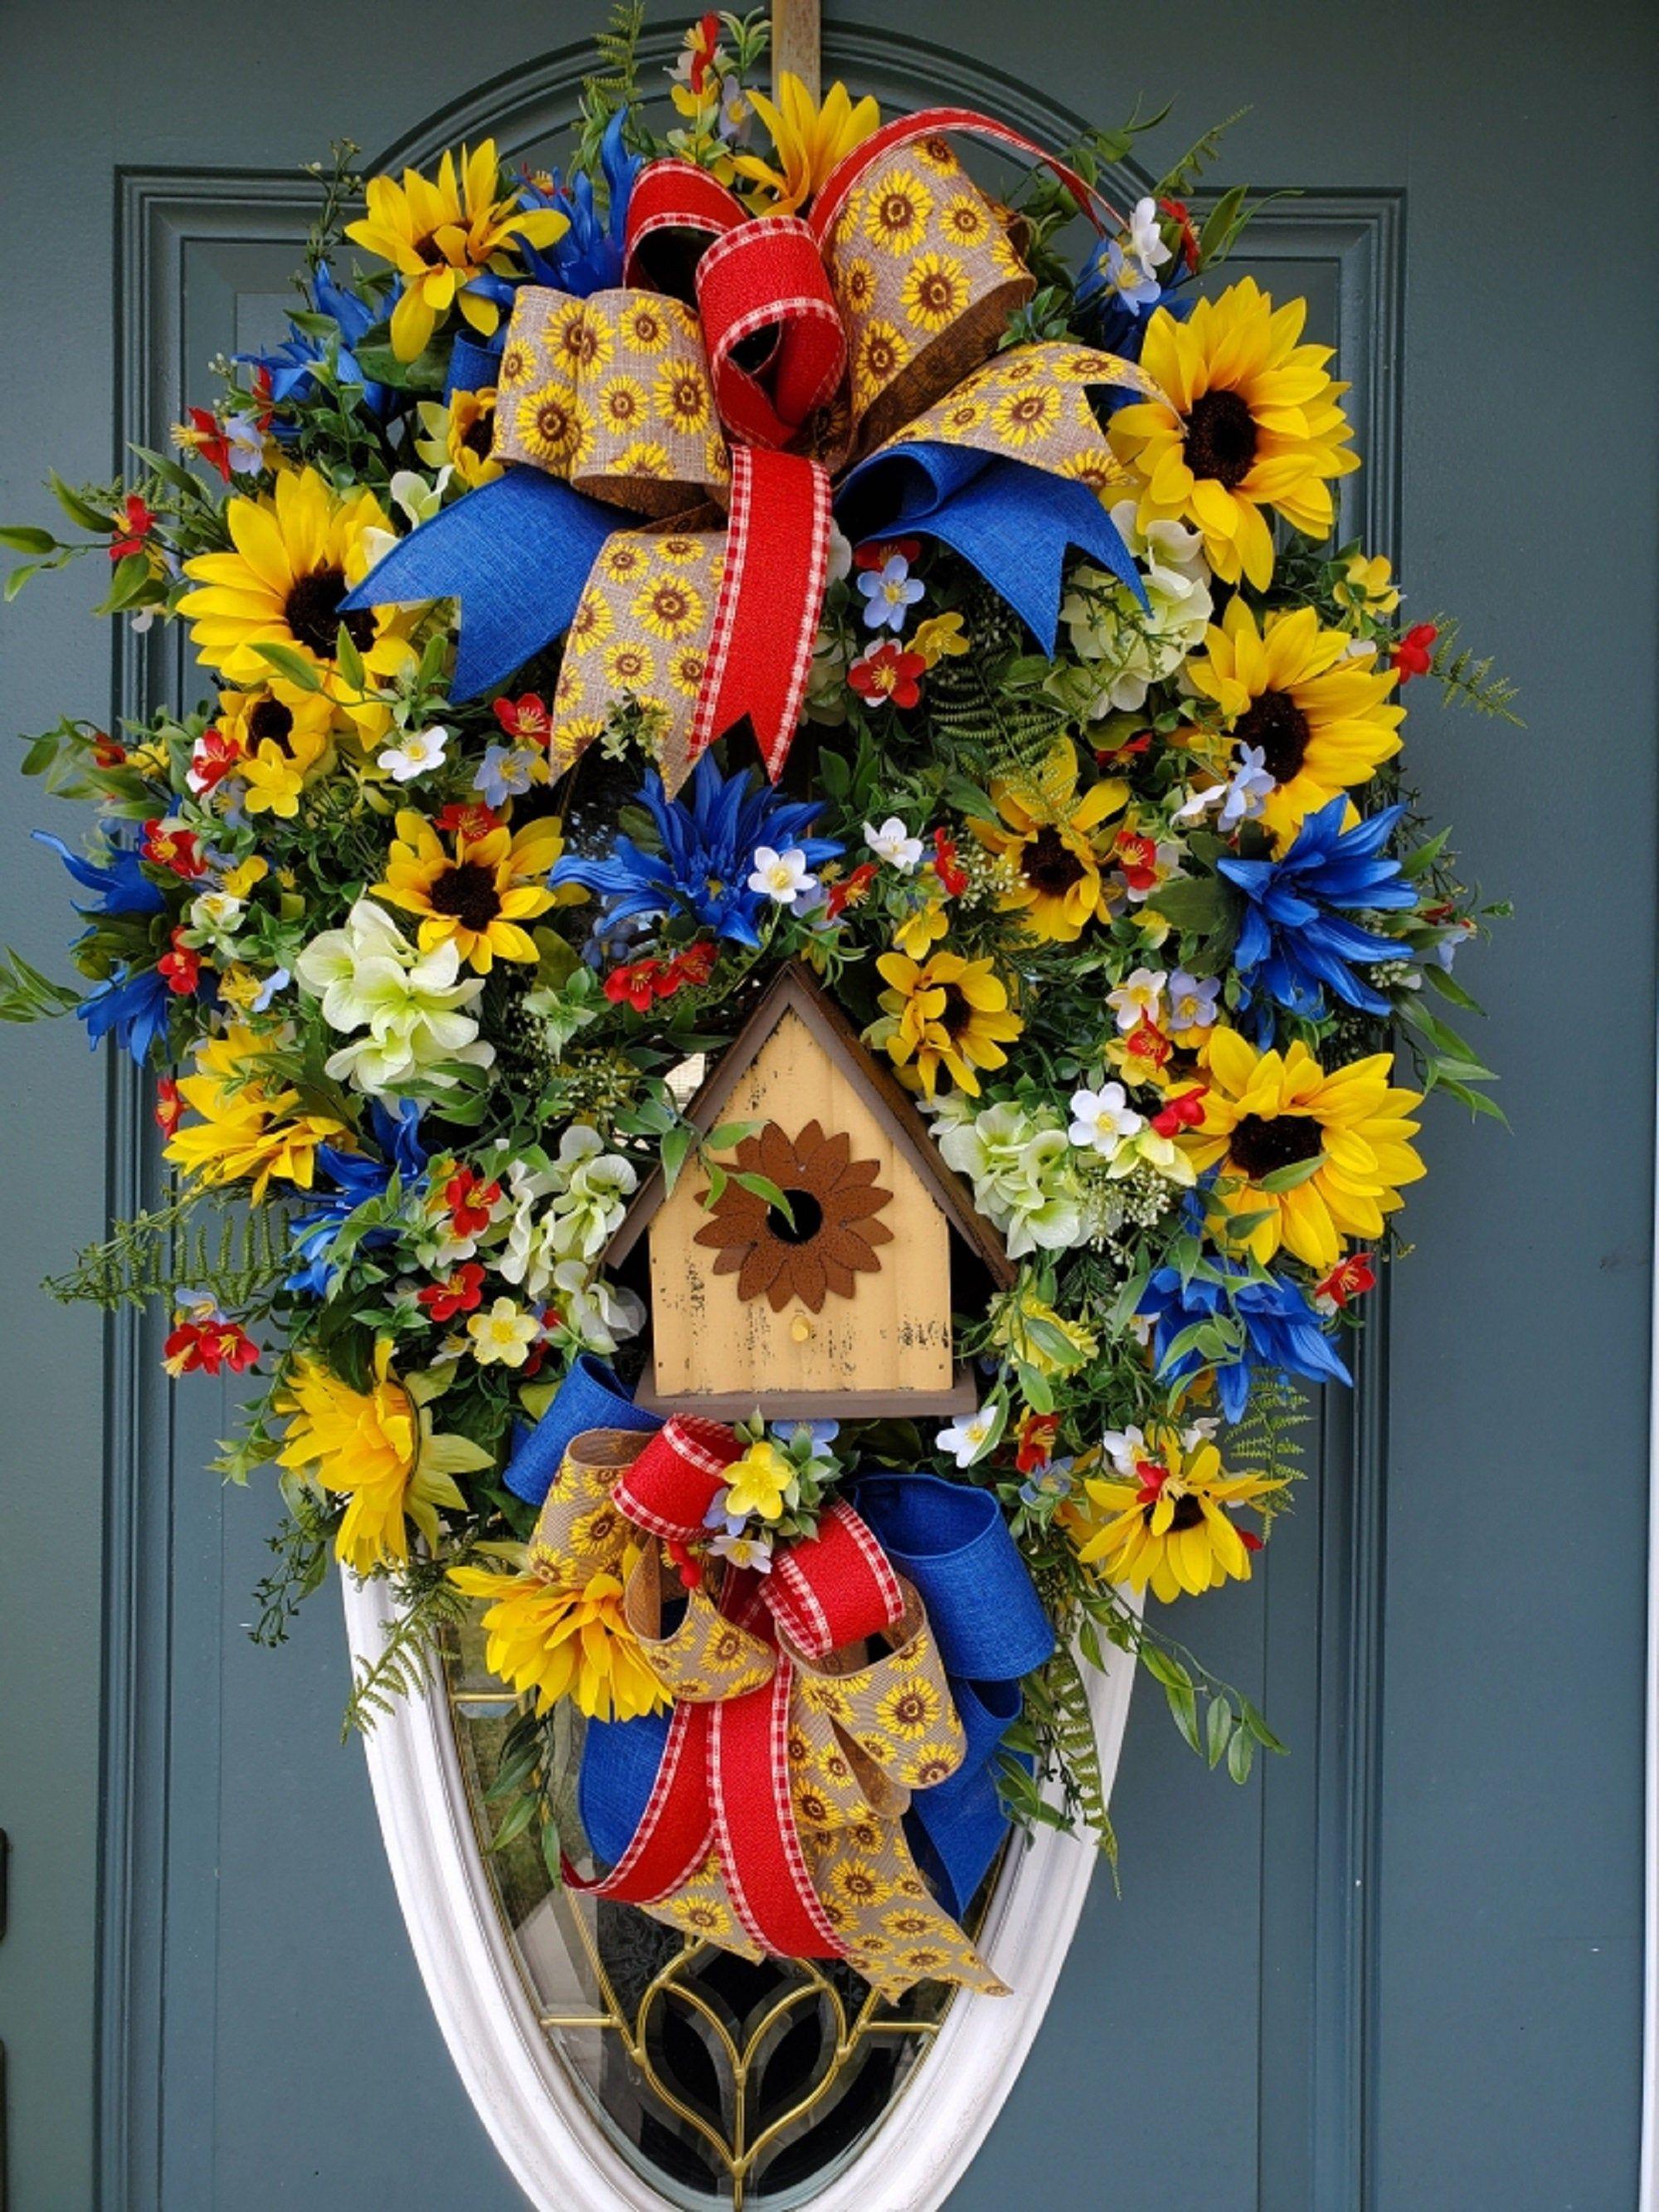 Photo of Sunflower Wreath / Spring Wreath / Summer Wreath for Front Door / Everyday Wreath / Birdhouse Wreath / Oval Wreath / Deluxe Summer Wreath